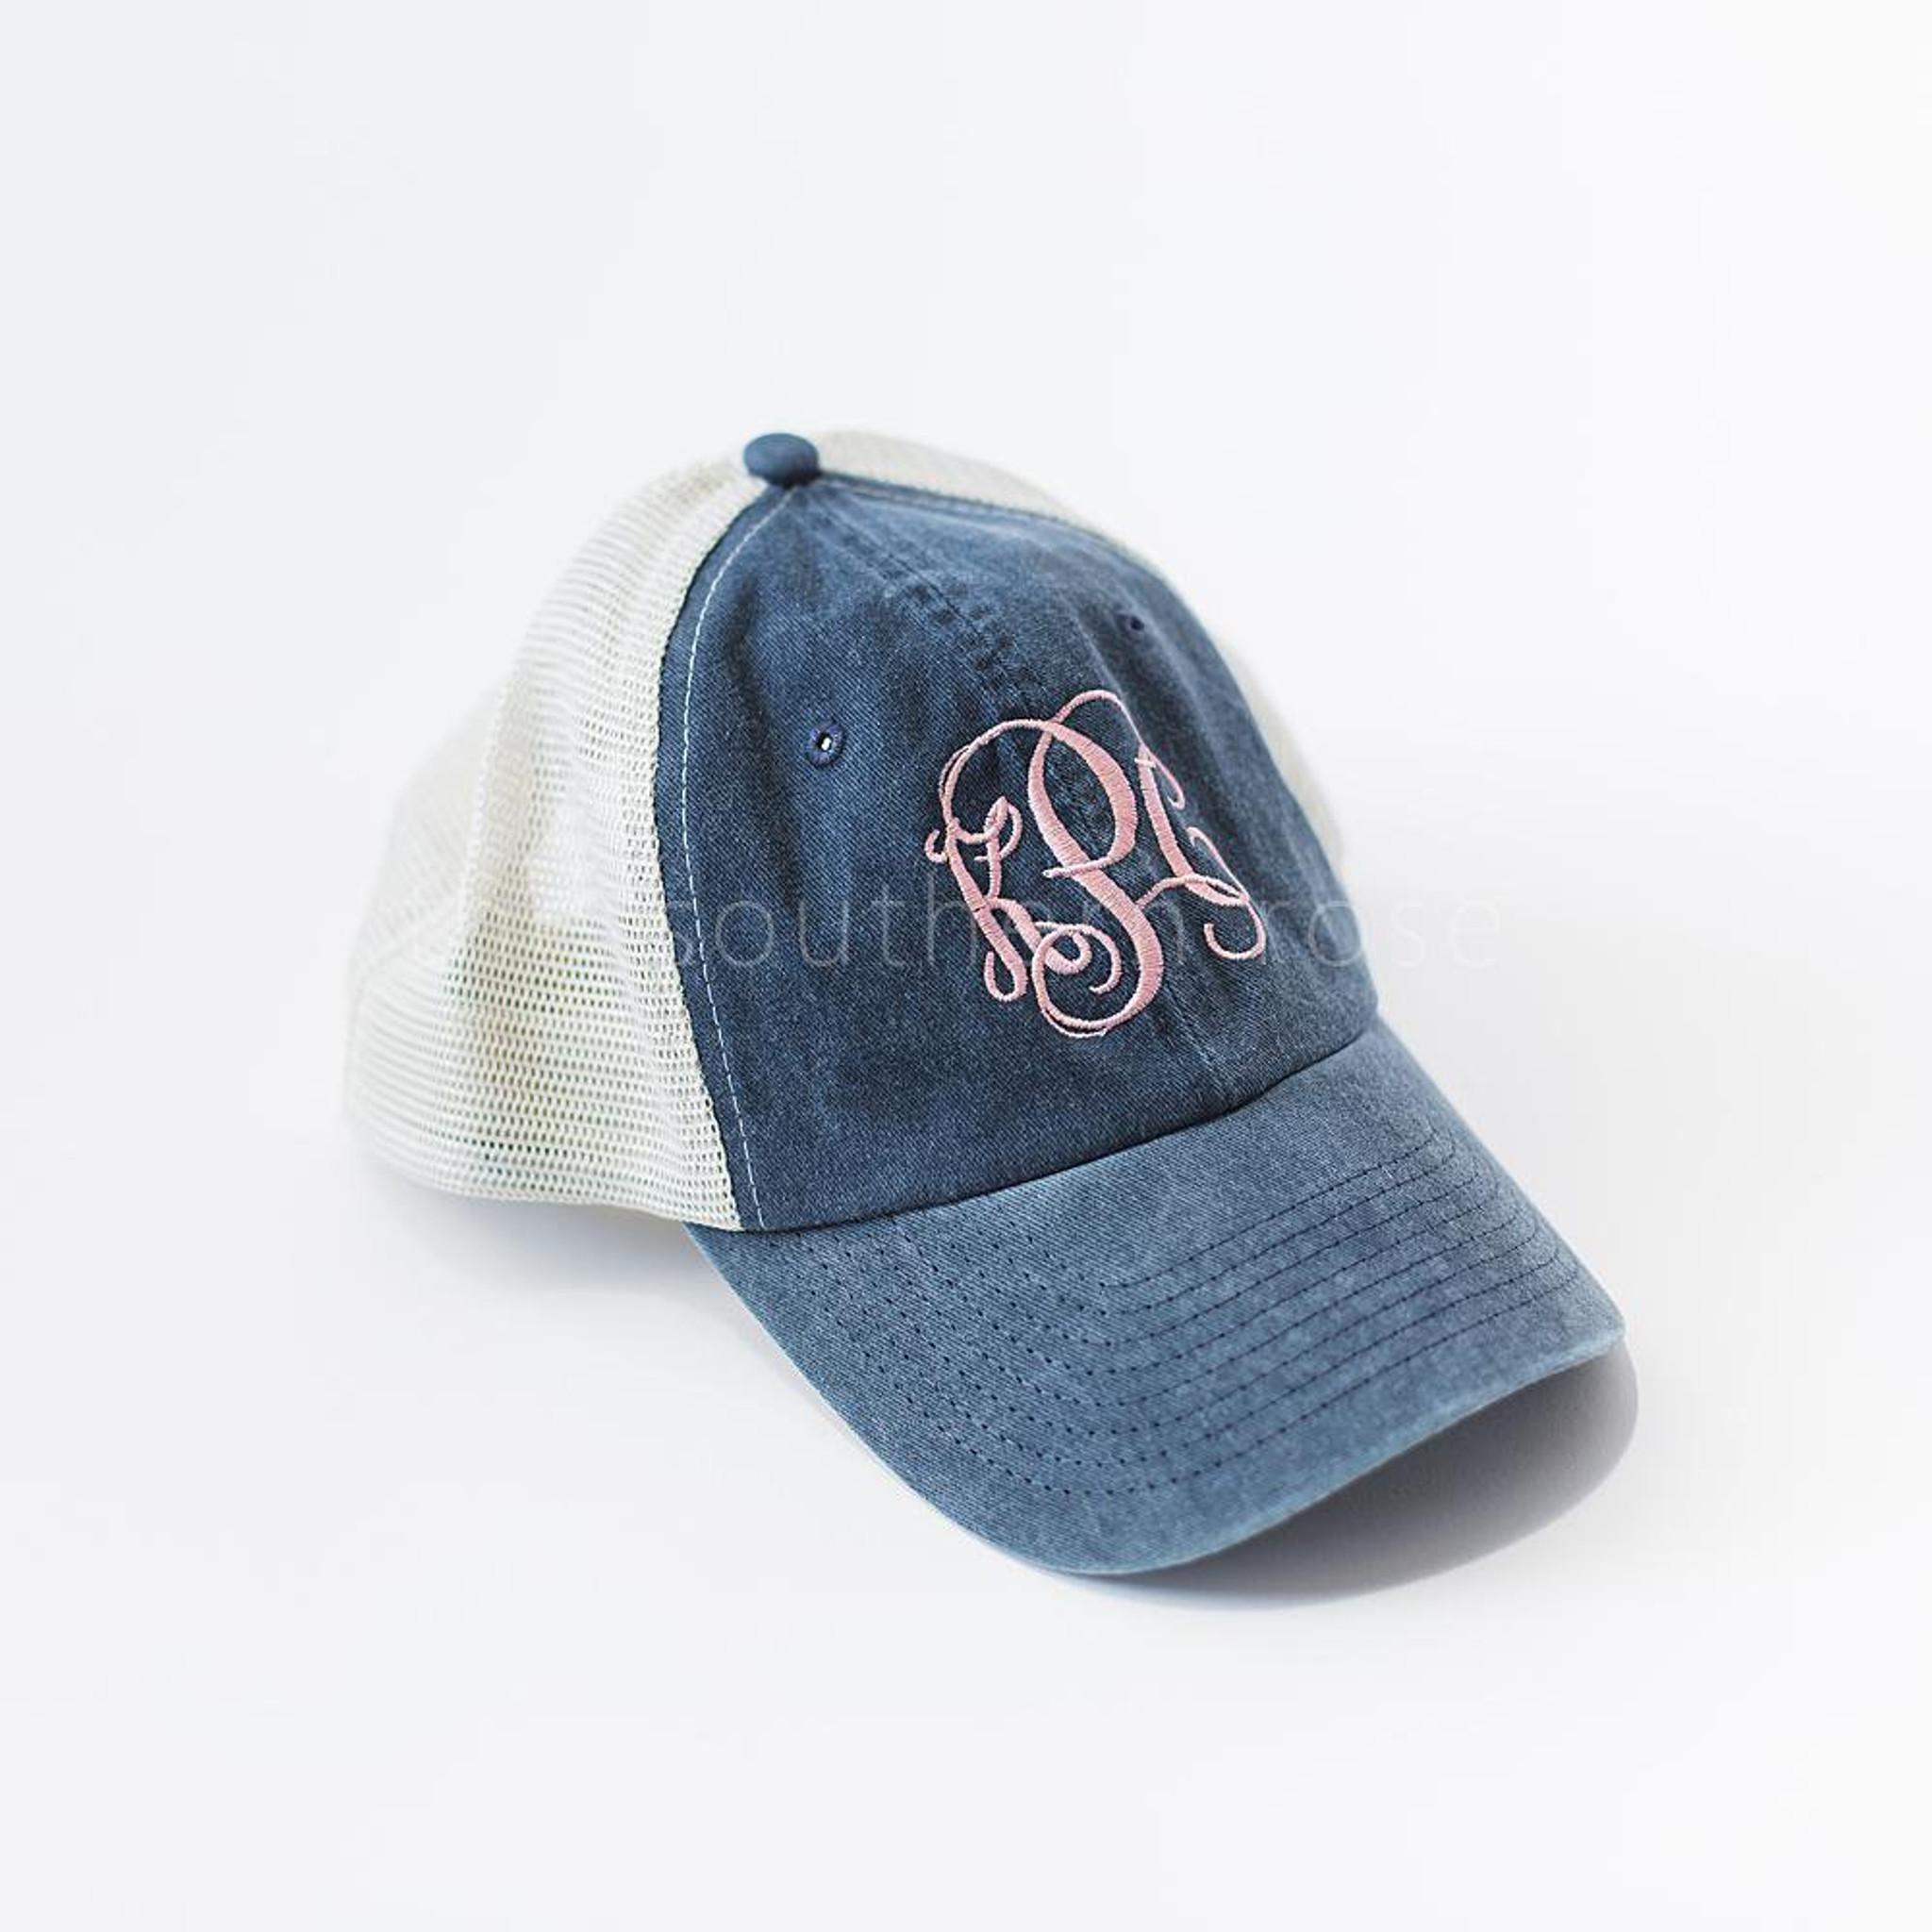 Monogrammed Trucker Hat - Navy